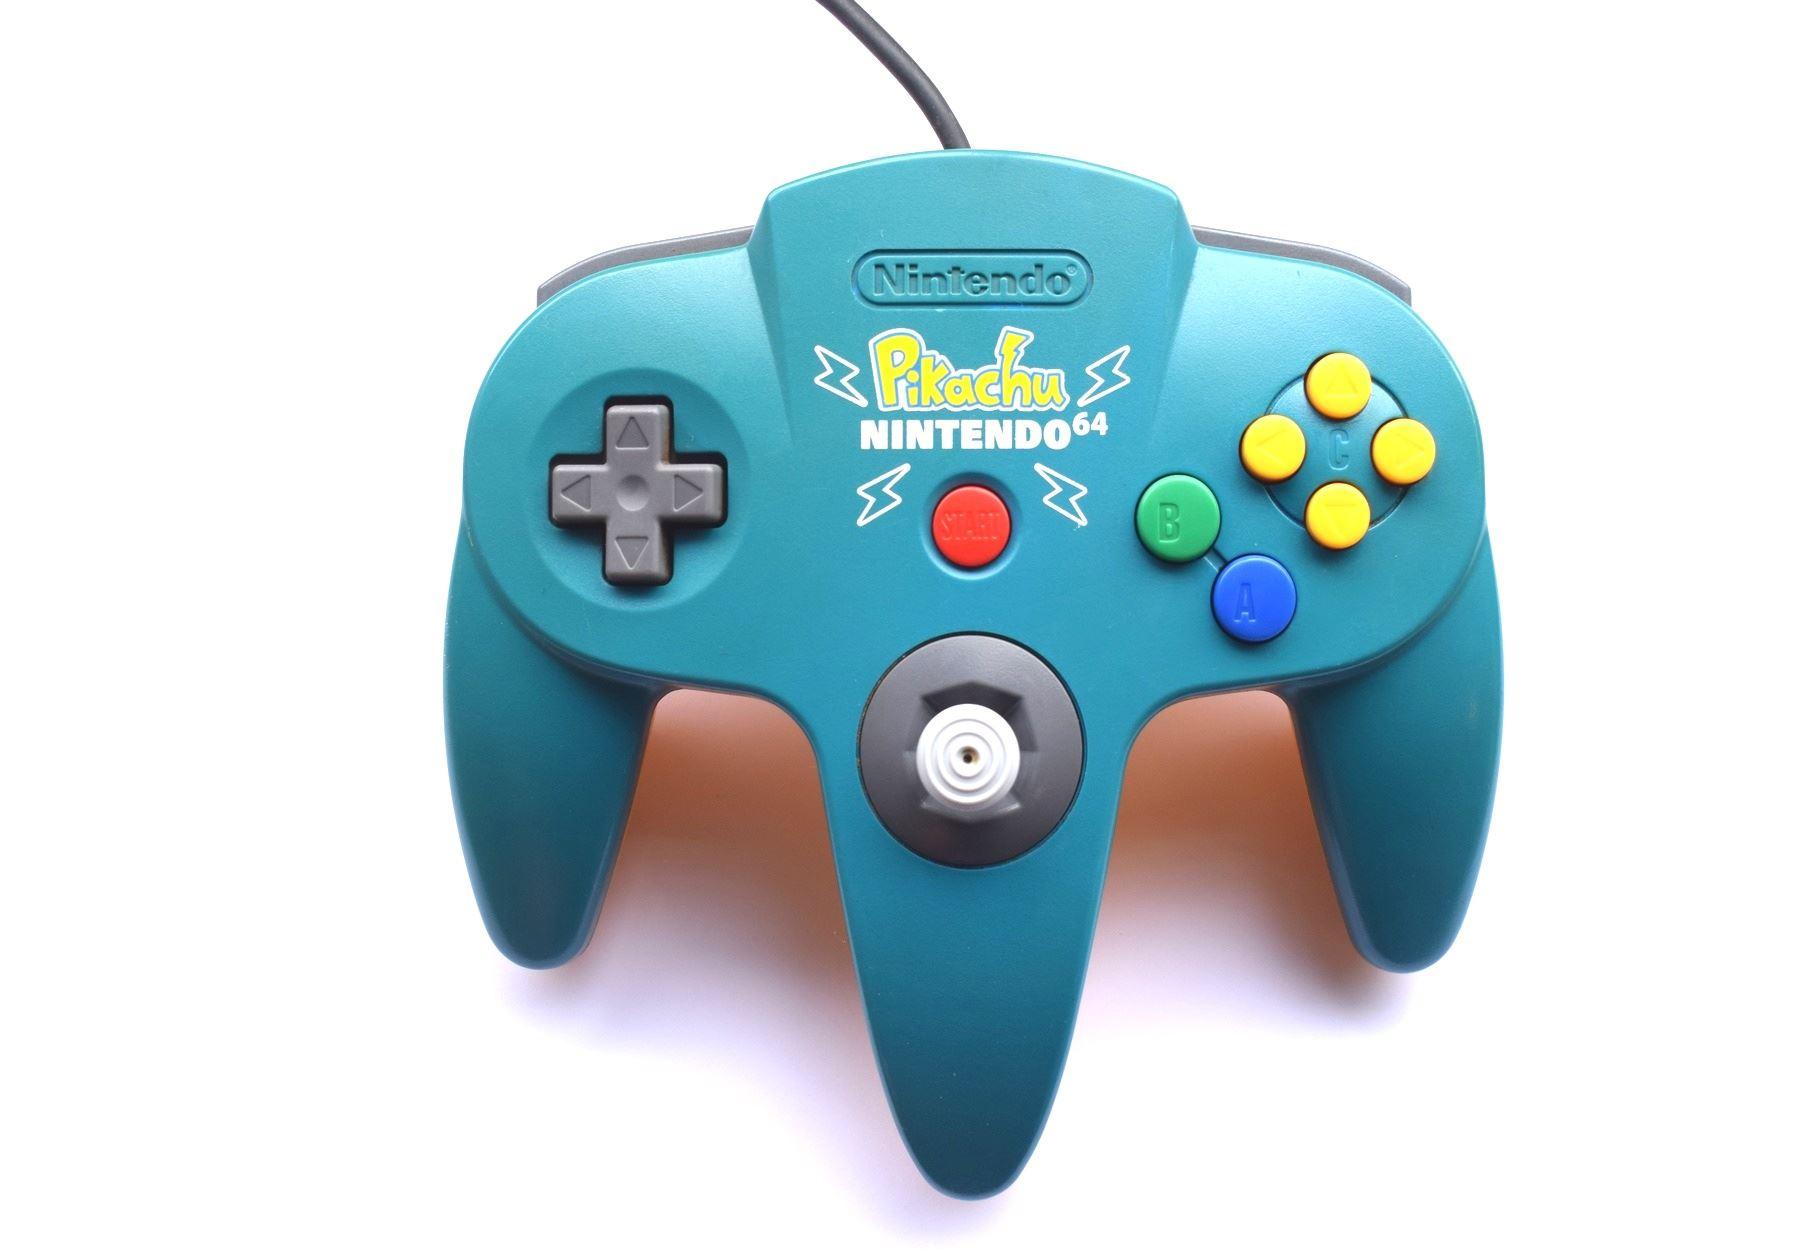 Official-Original-Nintendo-64-N64-Genuine-Controller-Game-Pads thumbnail 11